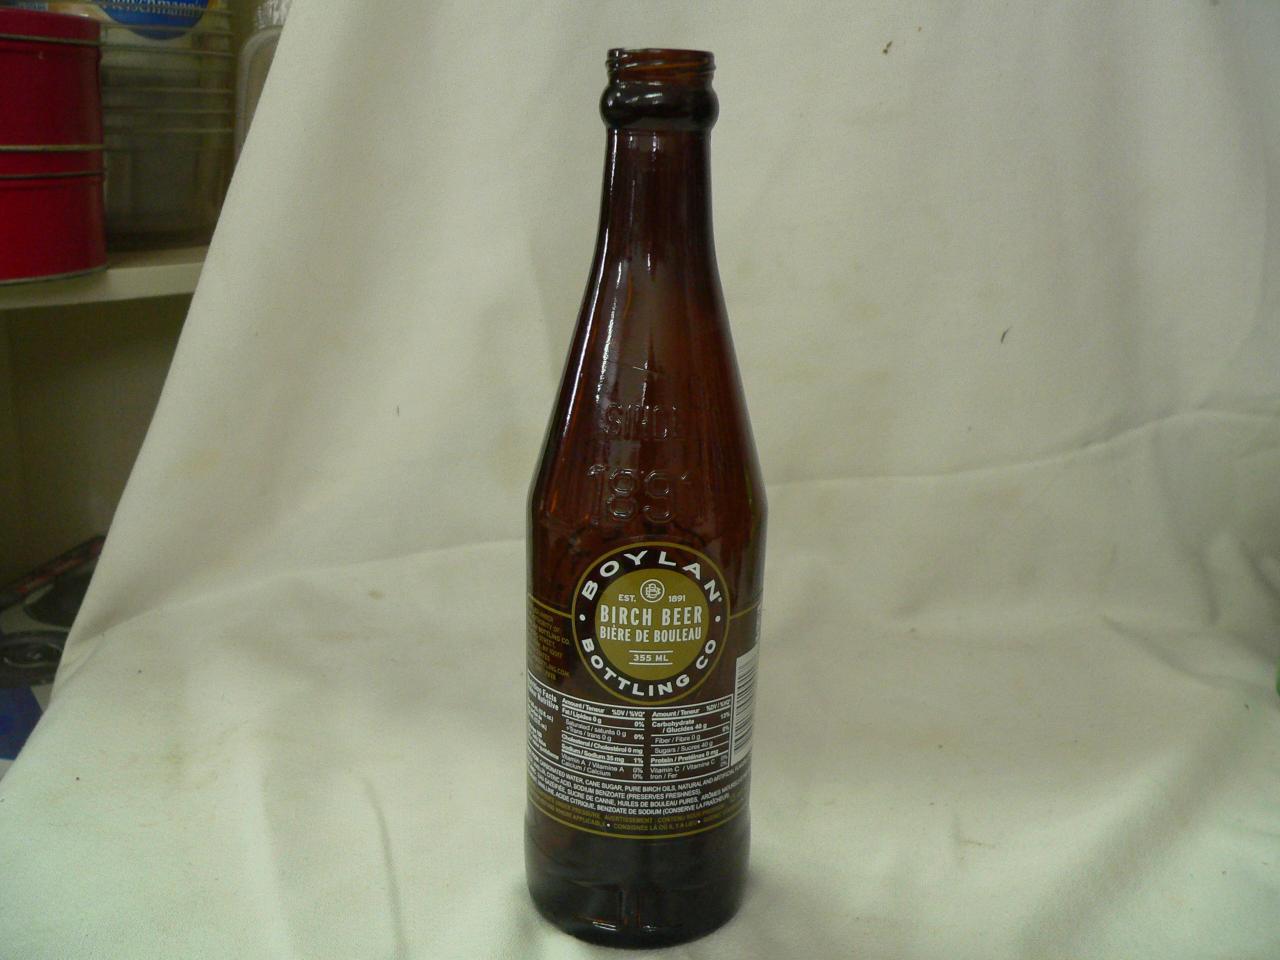 Bouteille boylan bottling # 3944.1